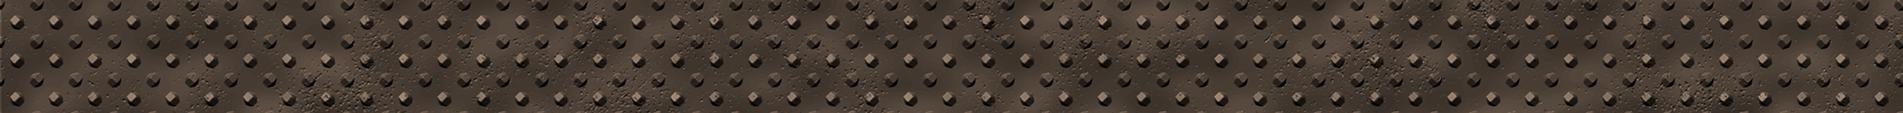 crossfit-diamond-plate-beige-4rcf-silver